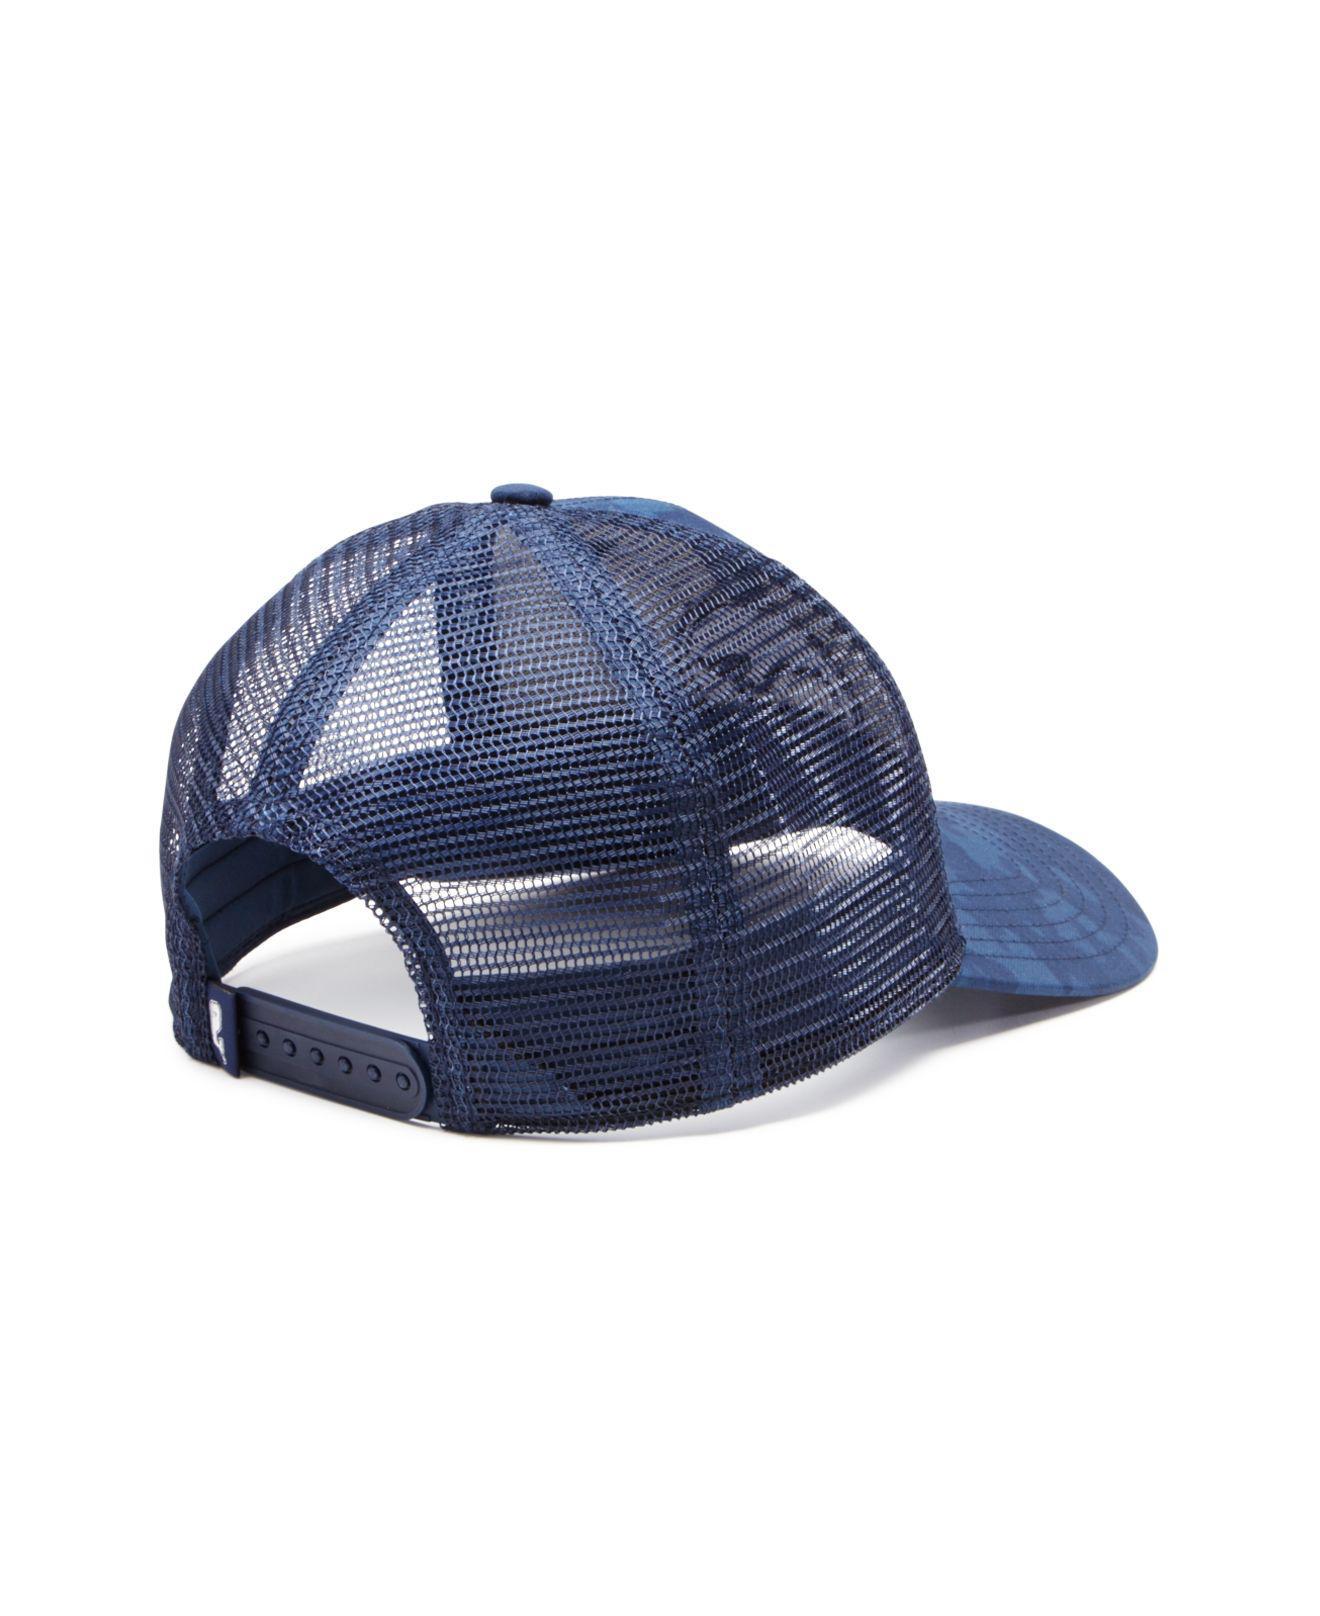 fe4bc27b41e34 Lyst - Vineyard Vines Camouflage Trucker Hat in Blue for Men